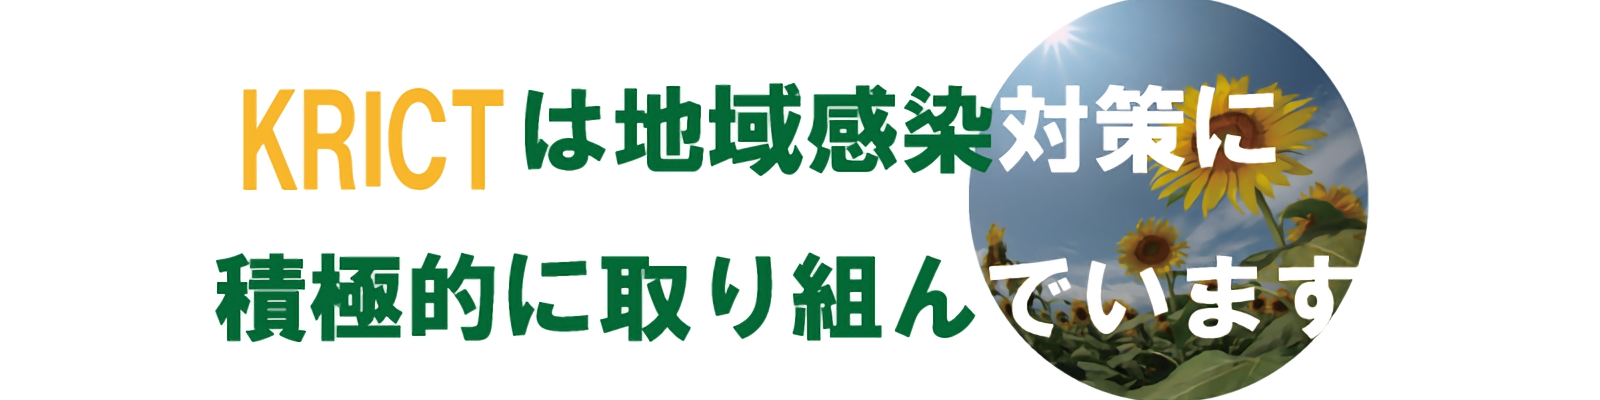 KRICT 北九州感染制御ティーム